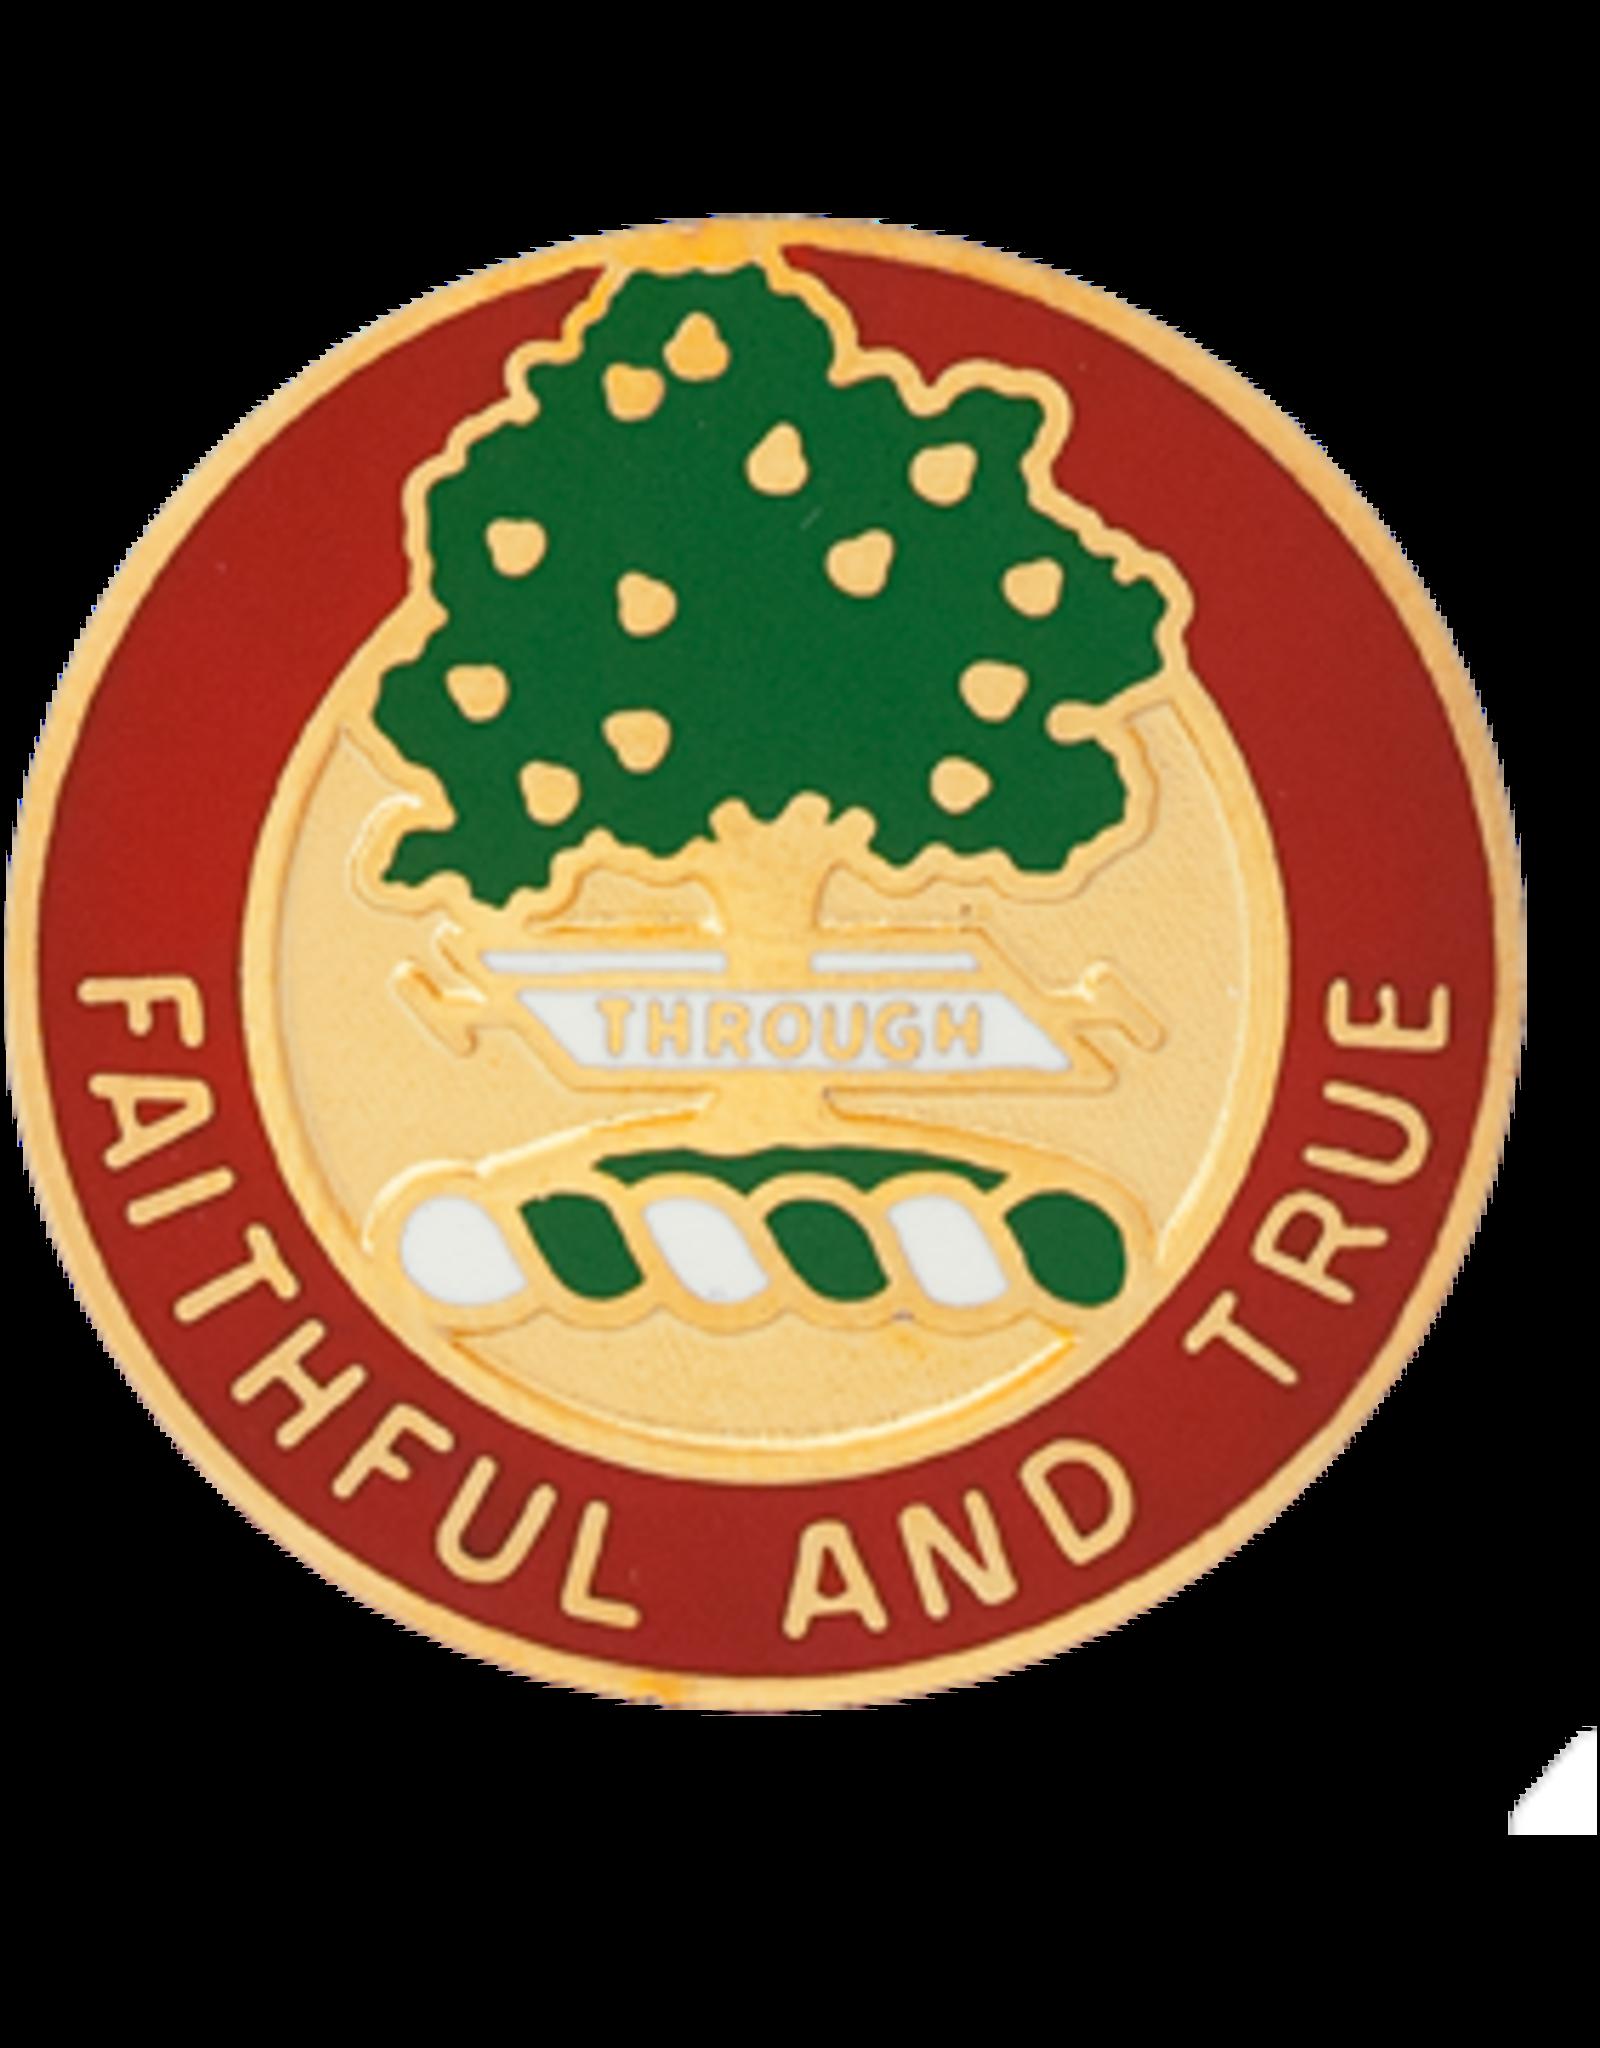 5th Field Artillery Unit Crest - Faithful And True